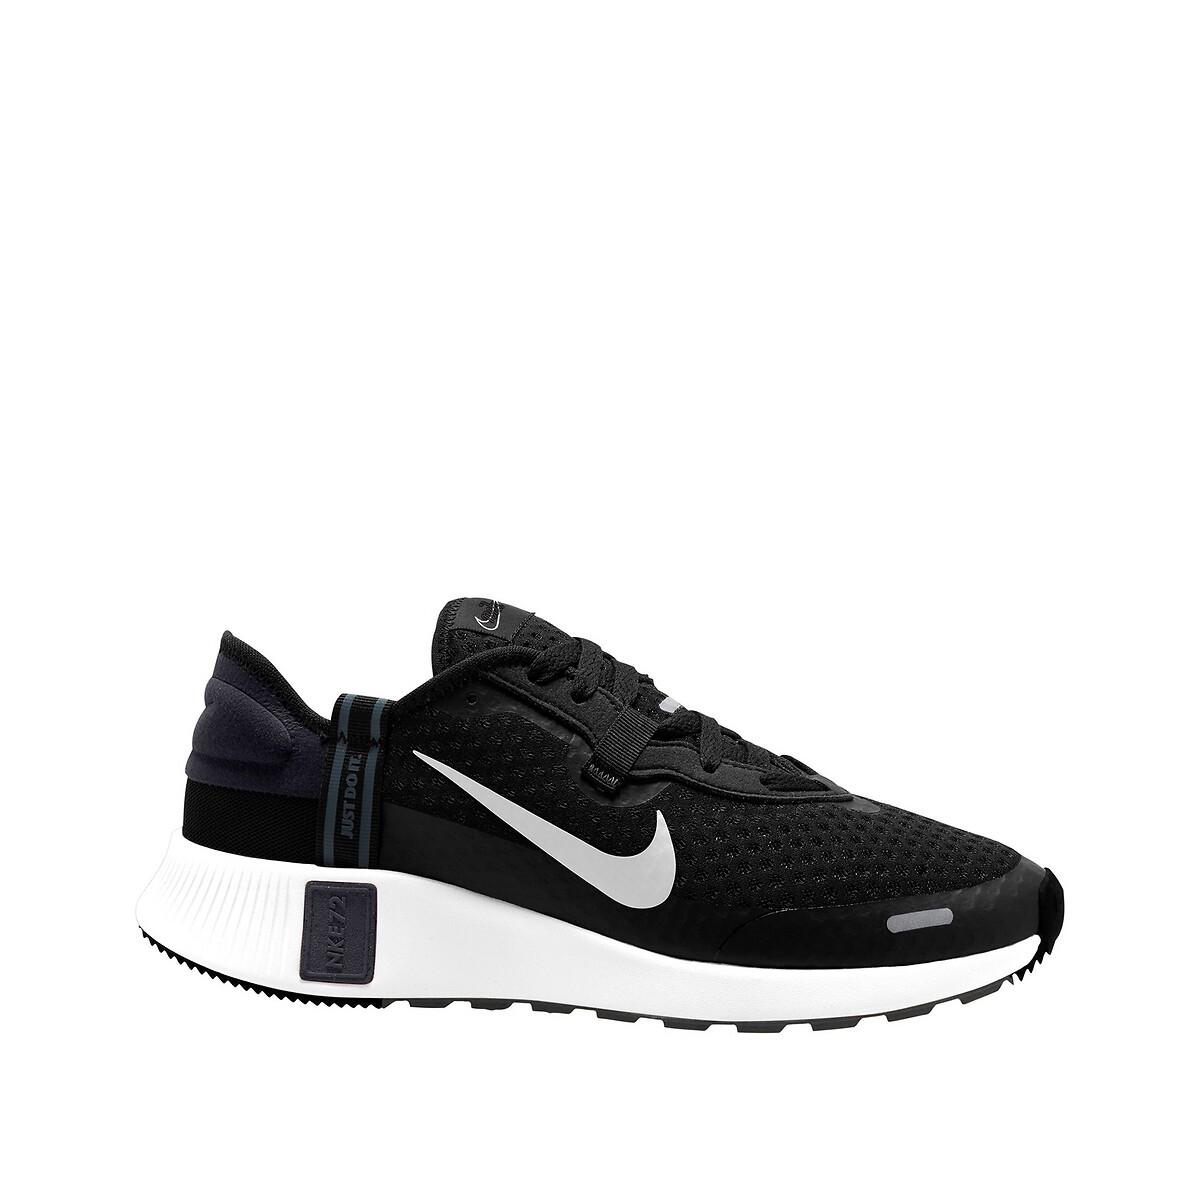 Nike Reposto Herenschoen Black/Dark Smoke Grey/Iron Grey/White Heren online kopen